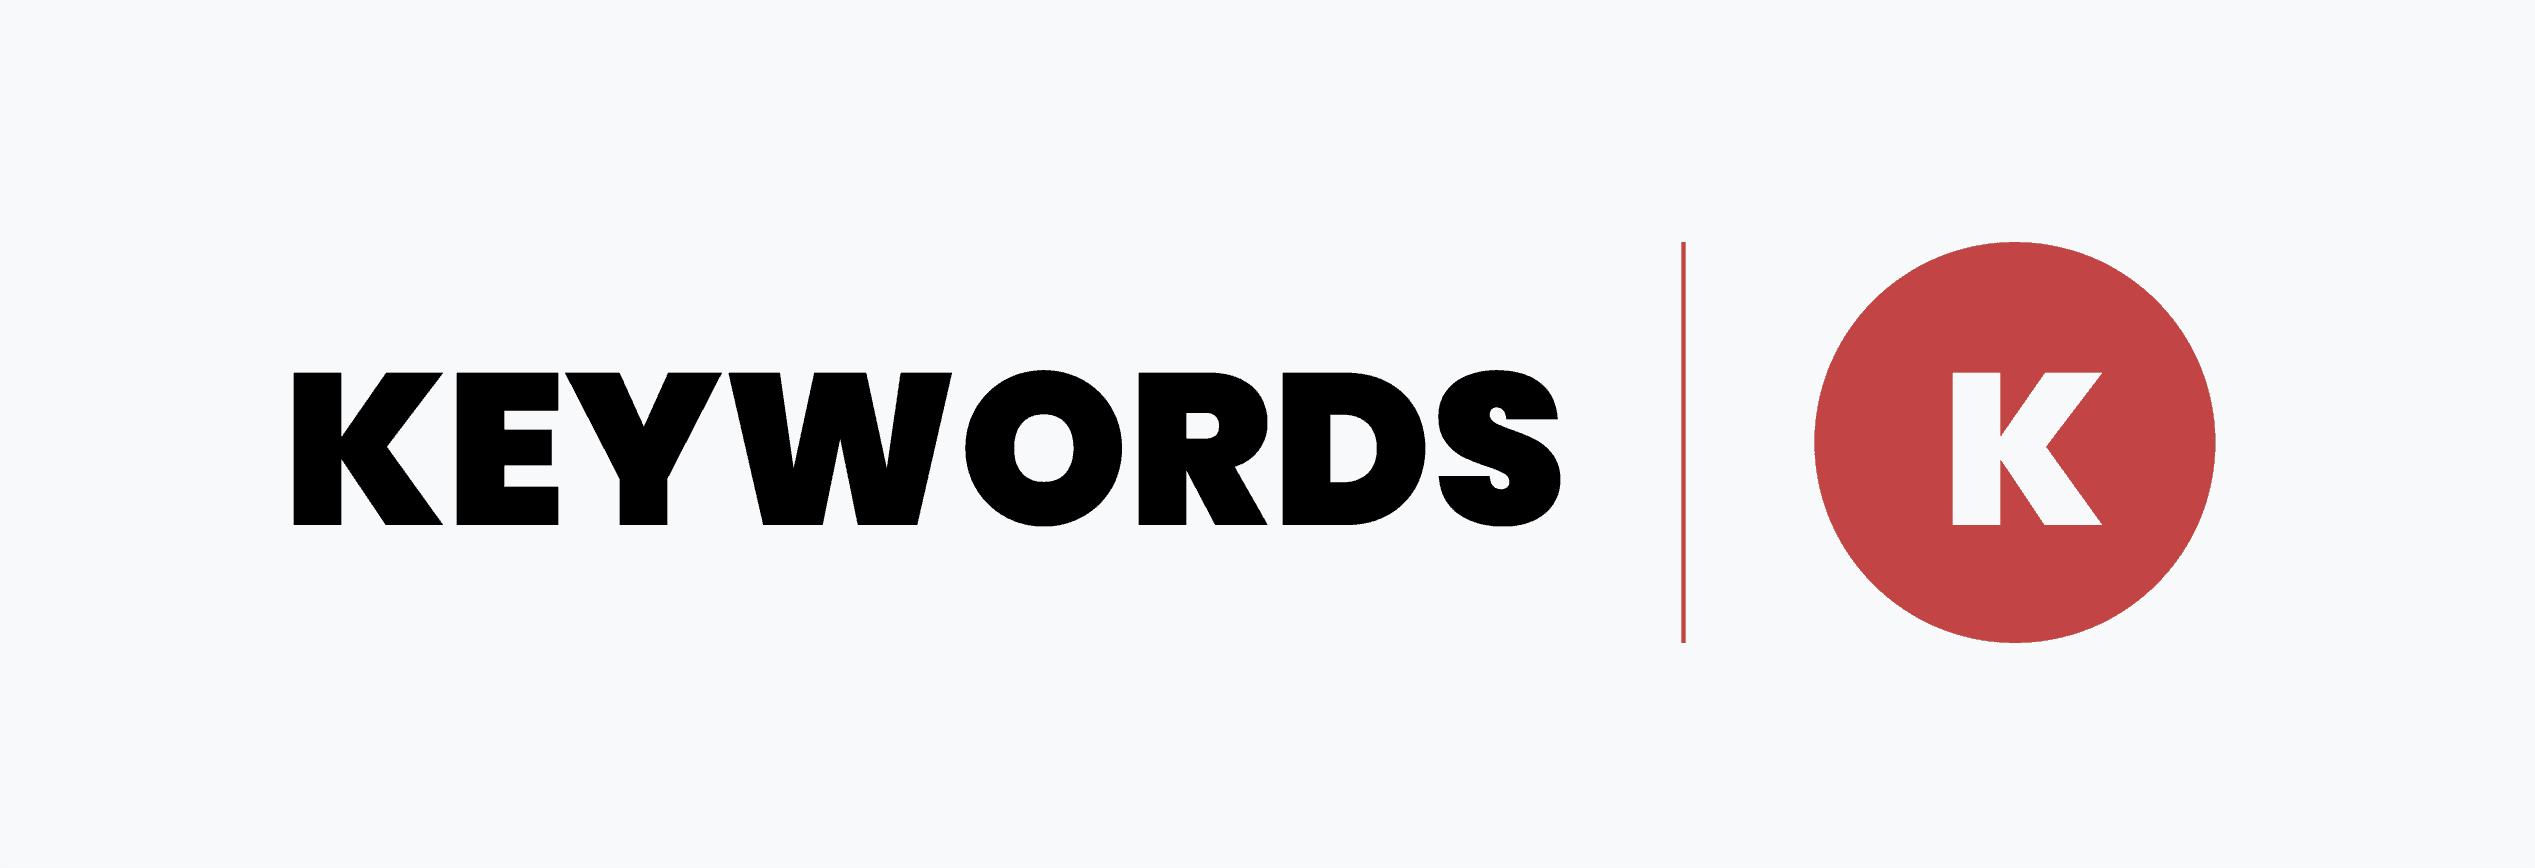 keywords-template